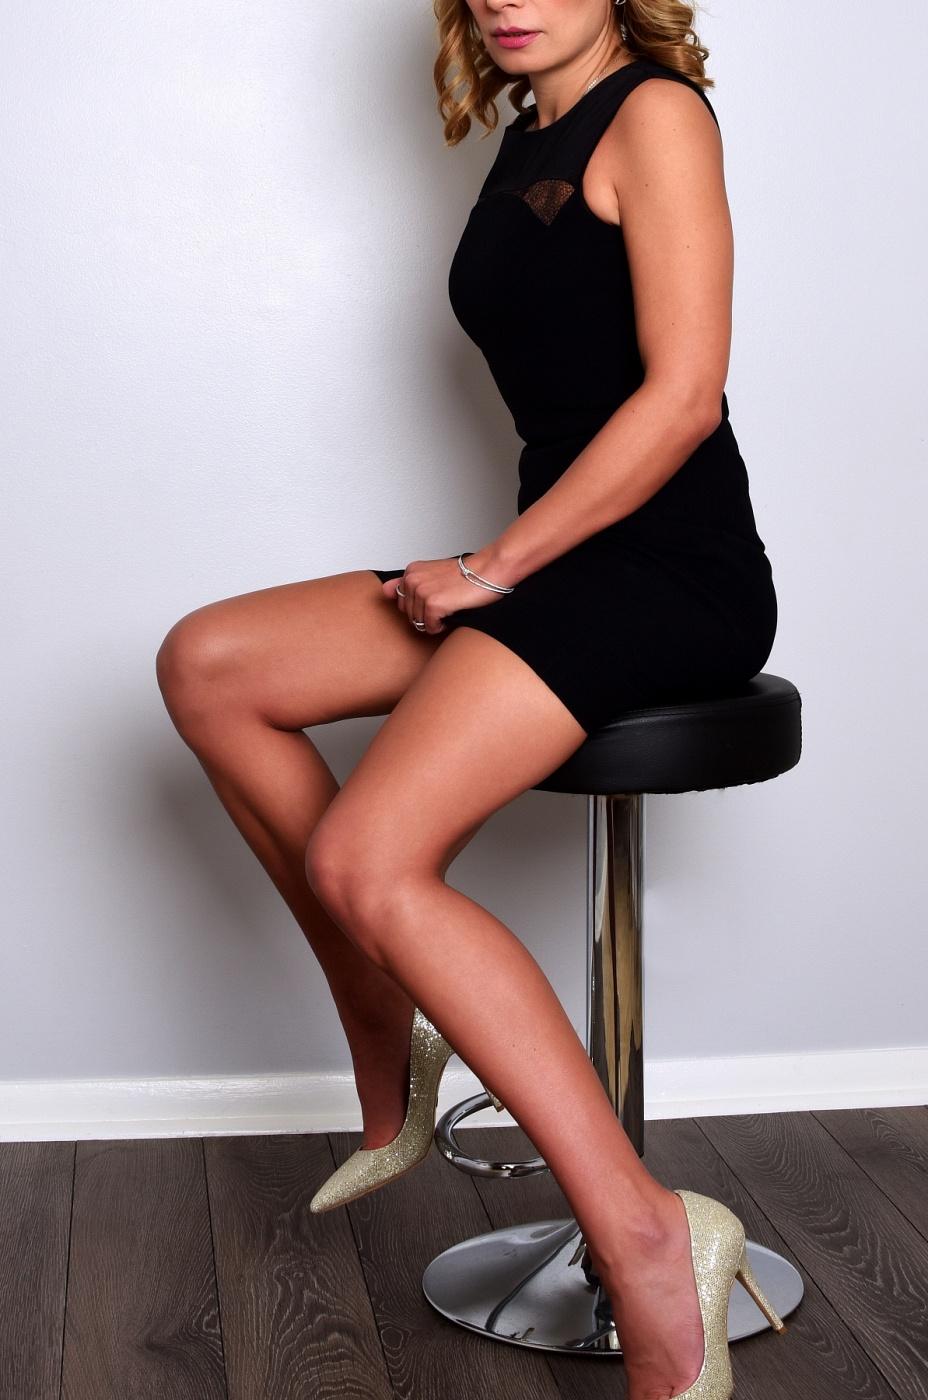 Natalia Tallinn